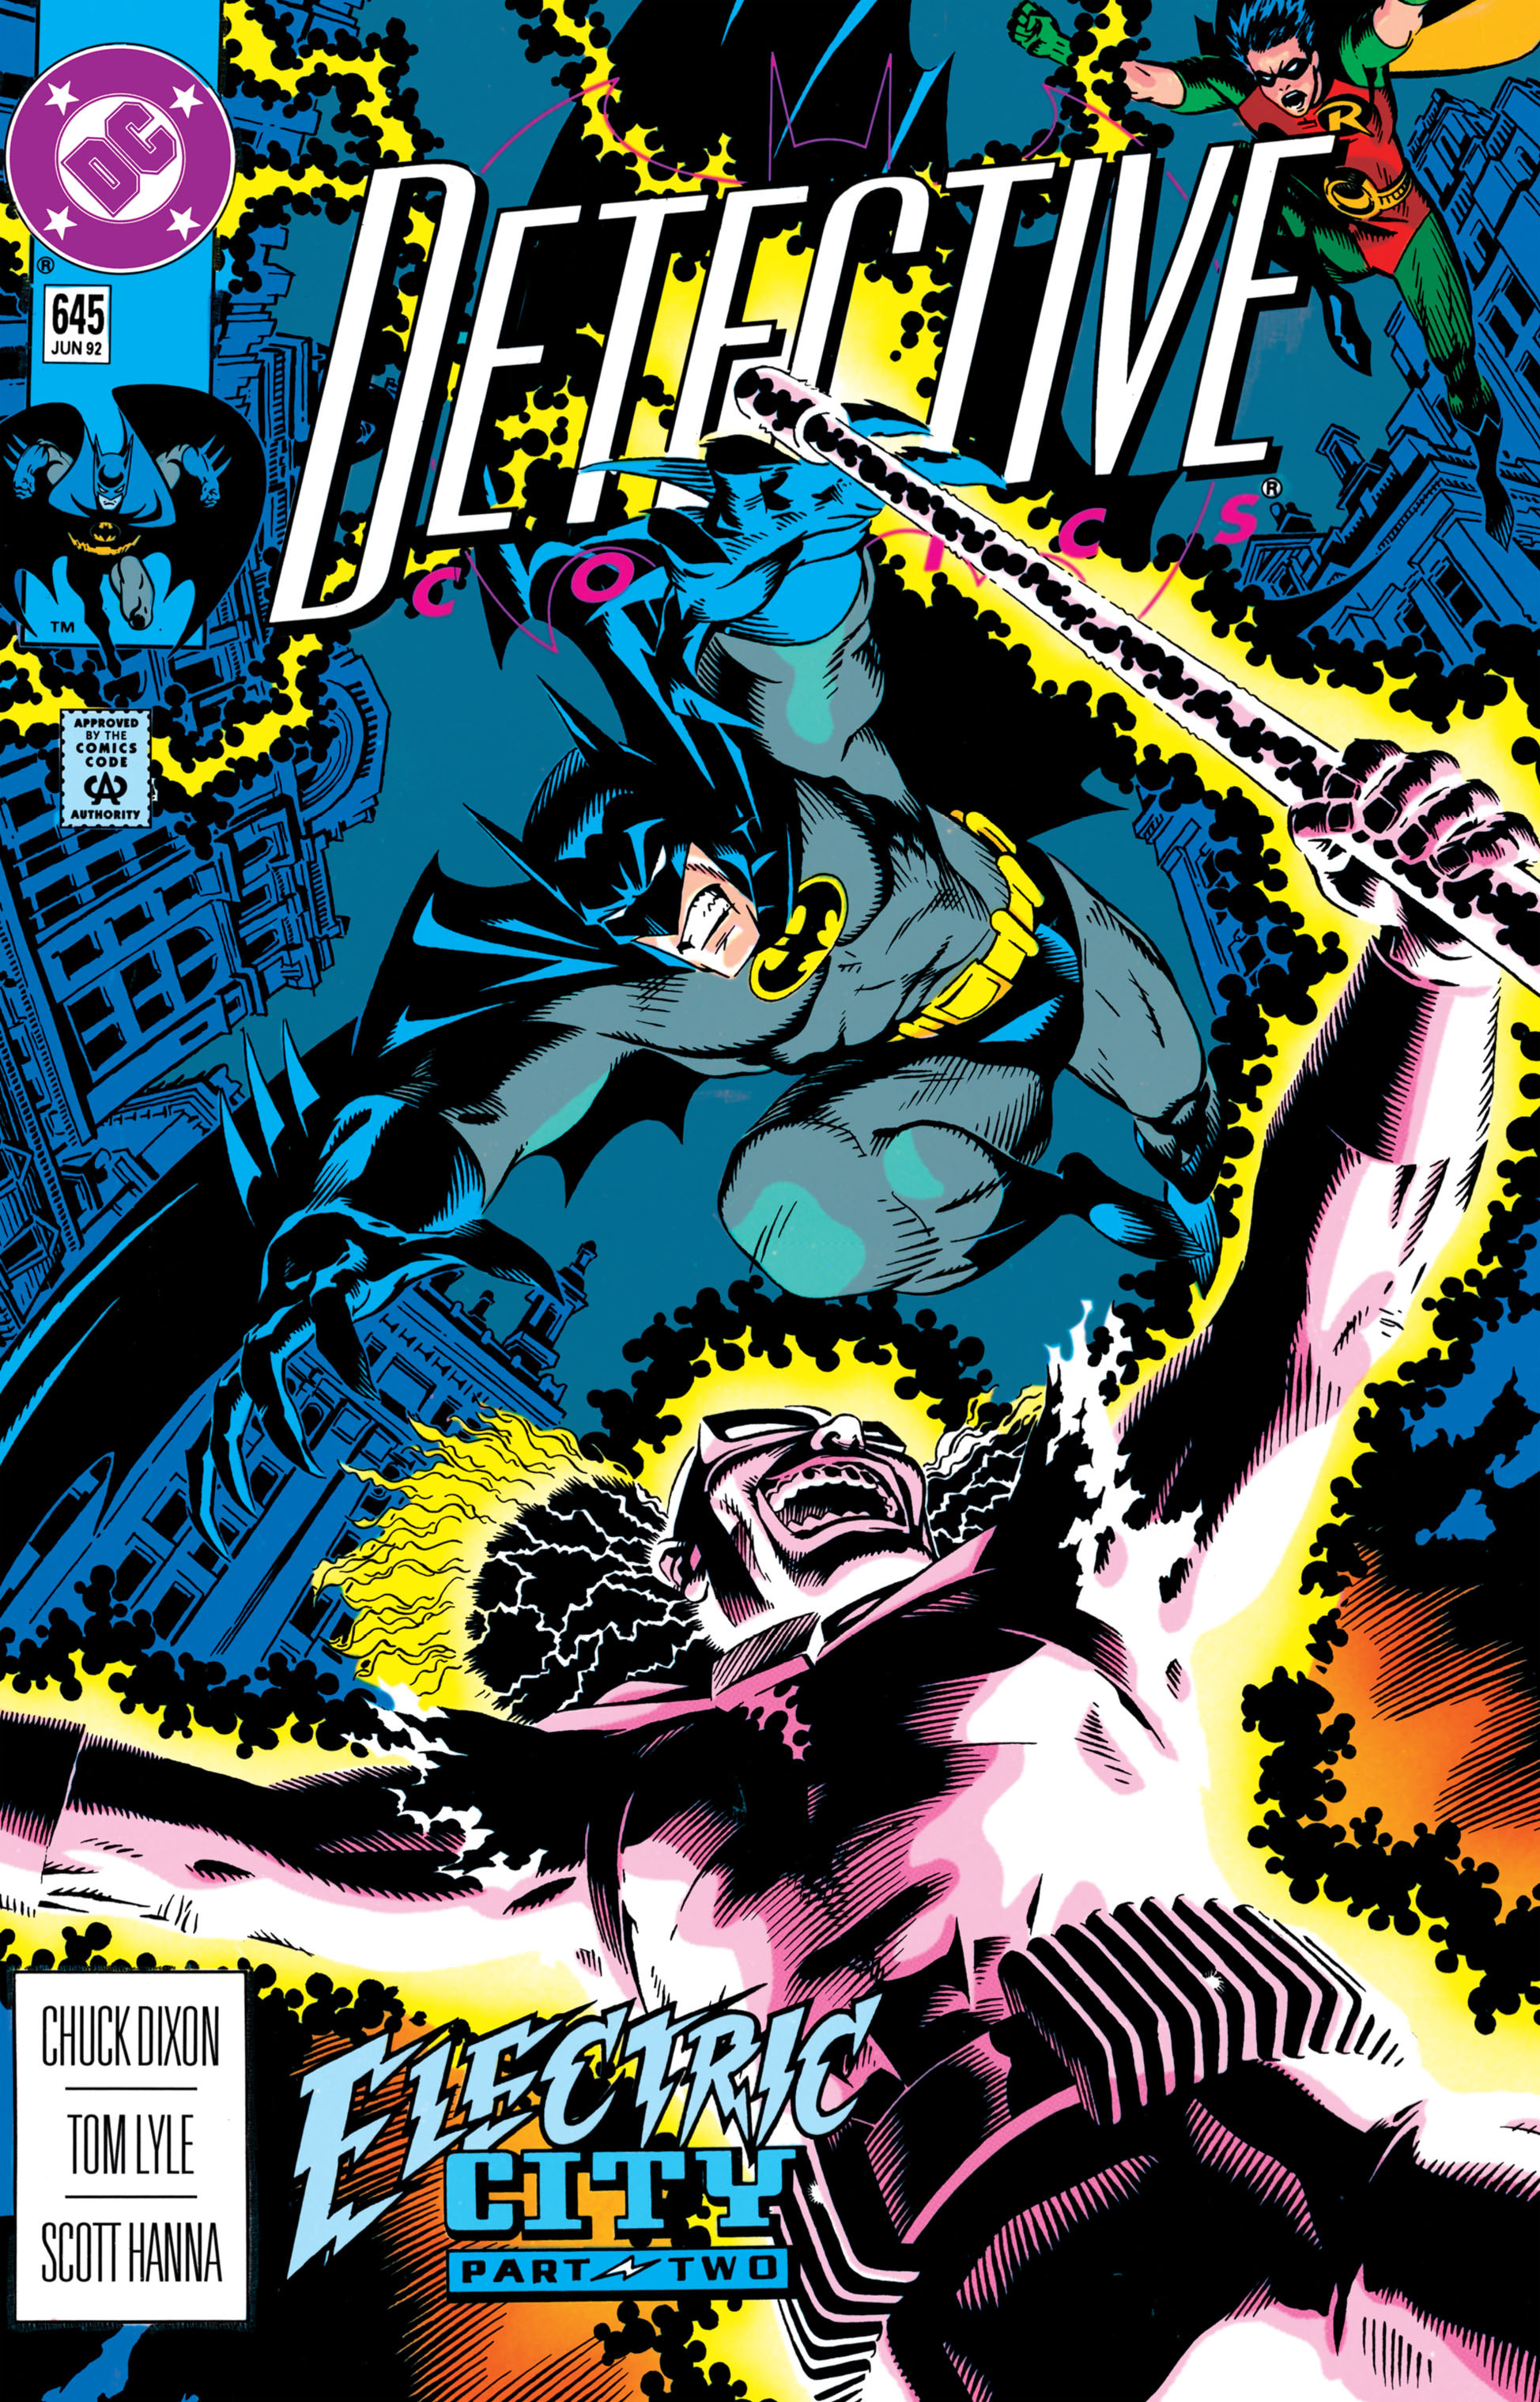 Detective Comics (1937) 645 Page 1